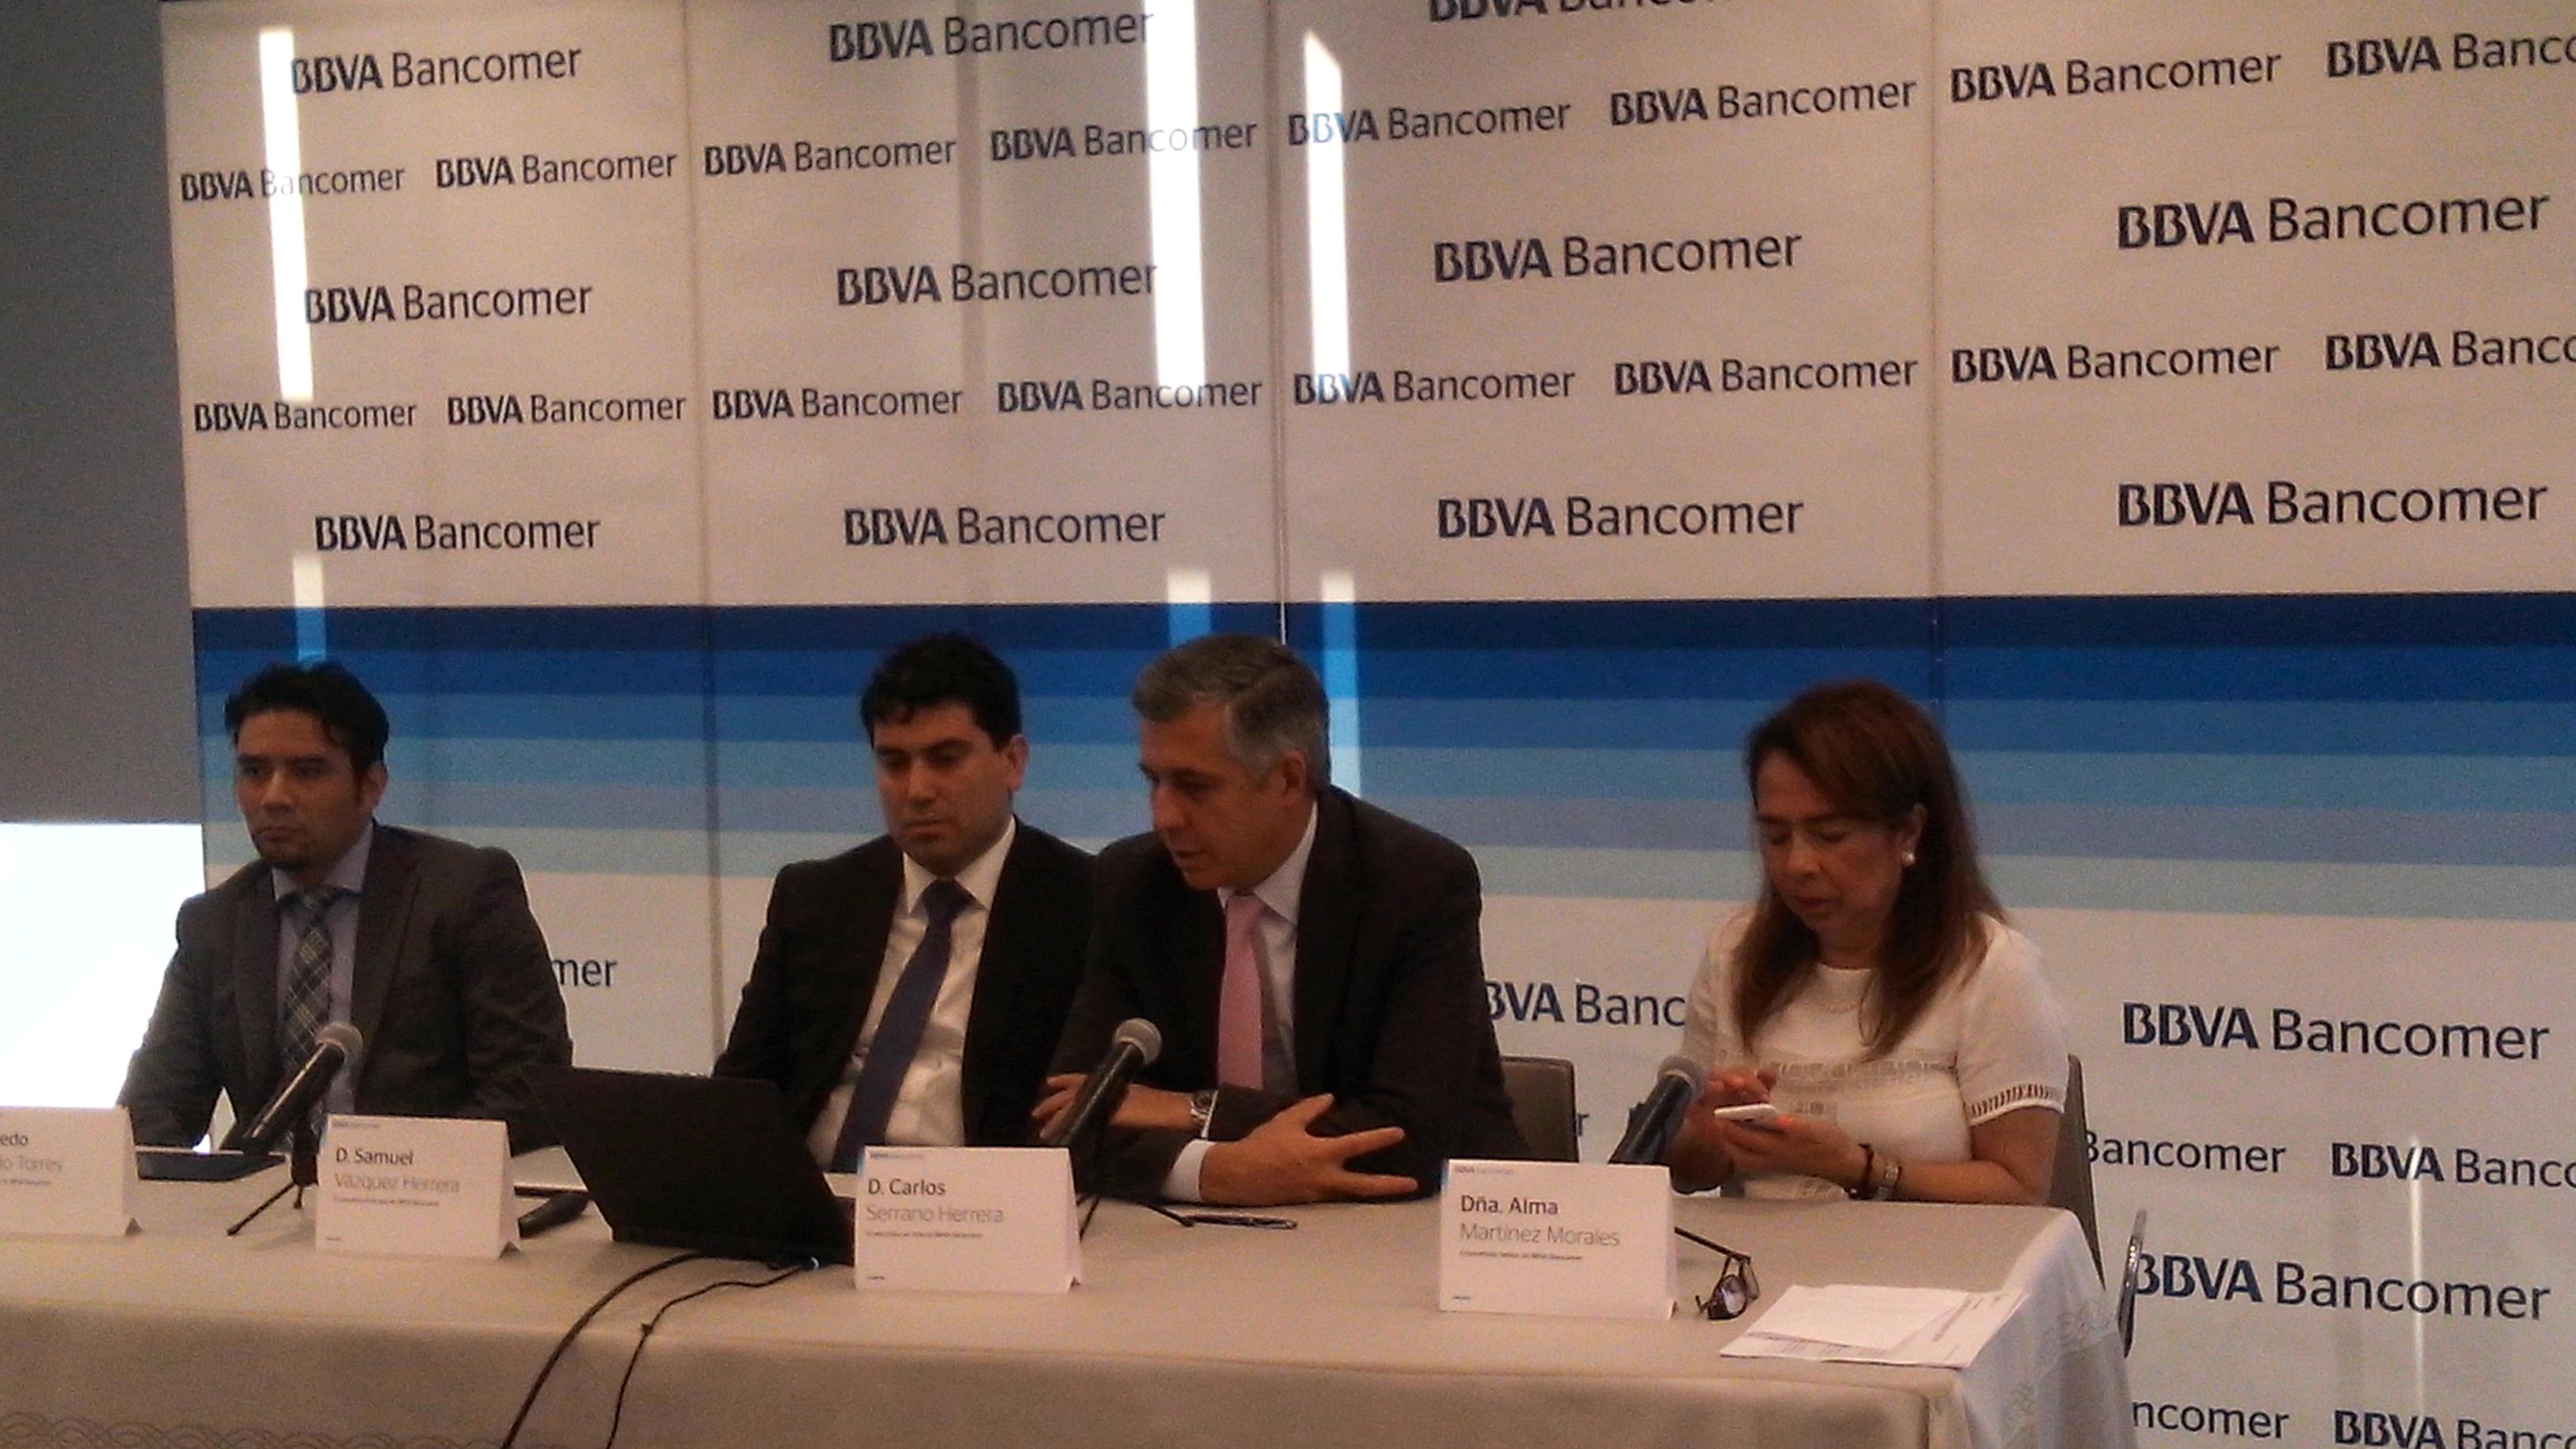 Bancomer2